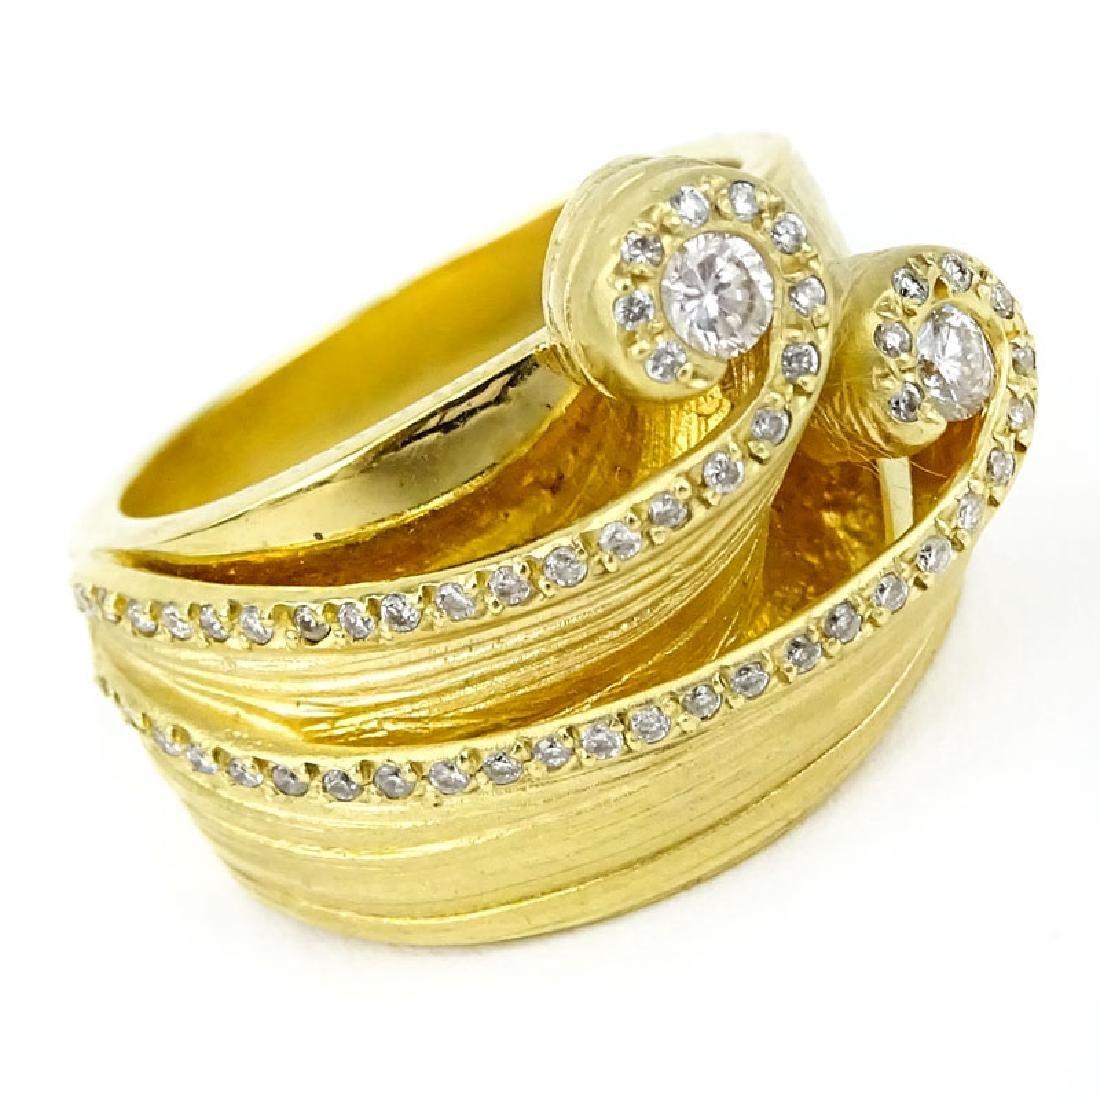 Vancox Approx. .75 Carat Diamond and 18 Karat Yellow - 2